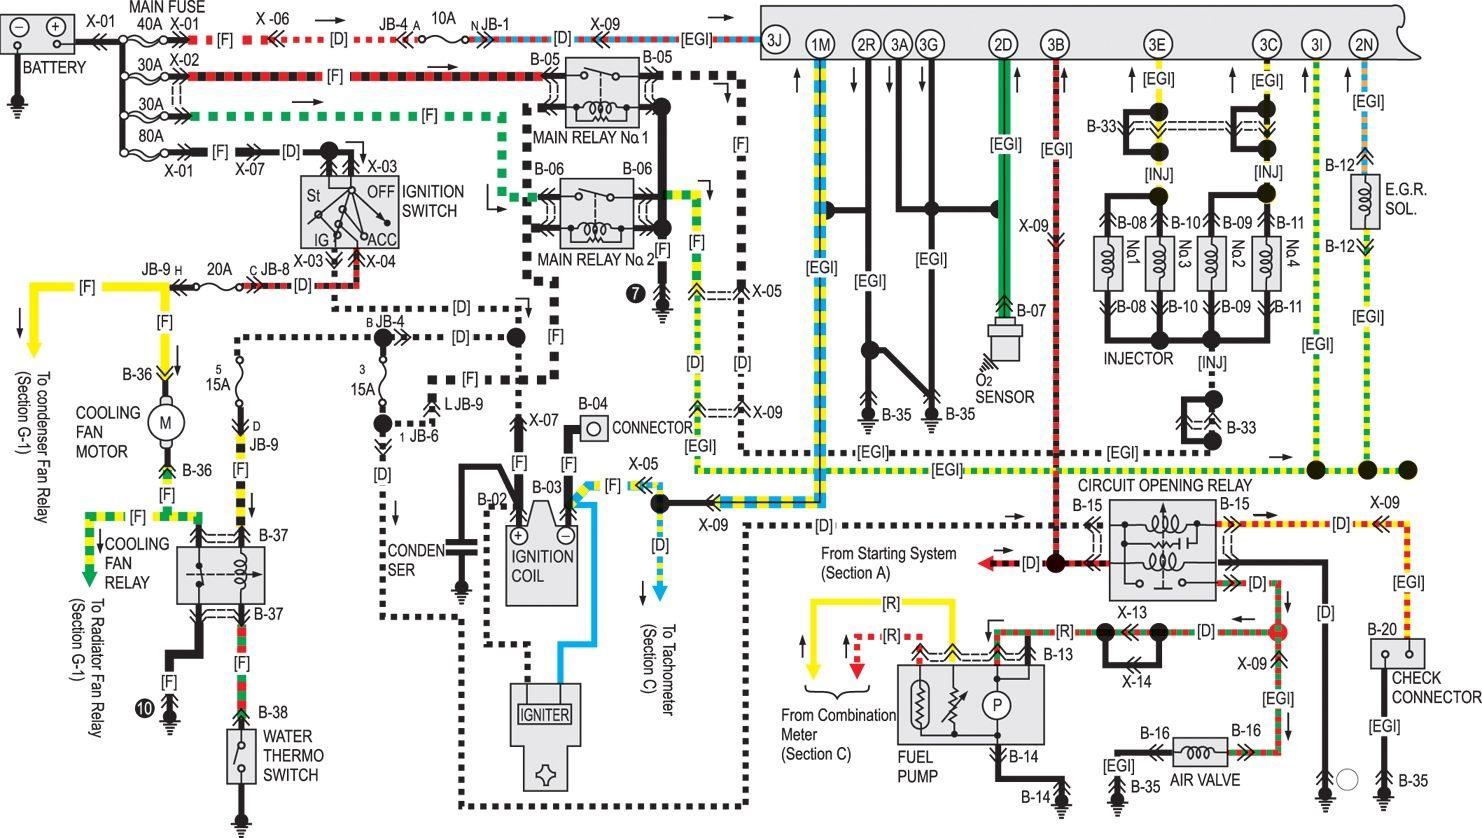 2009 mazda 2 wiring diagram wiring librarymazda 2 dy wiring diagram 9 [ 1482 x 838 Pixel ]